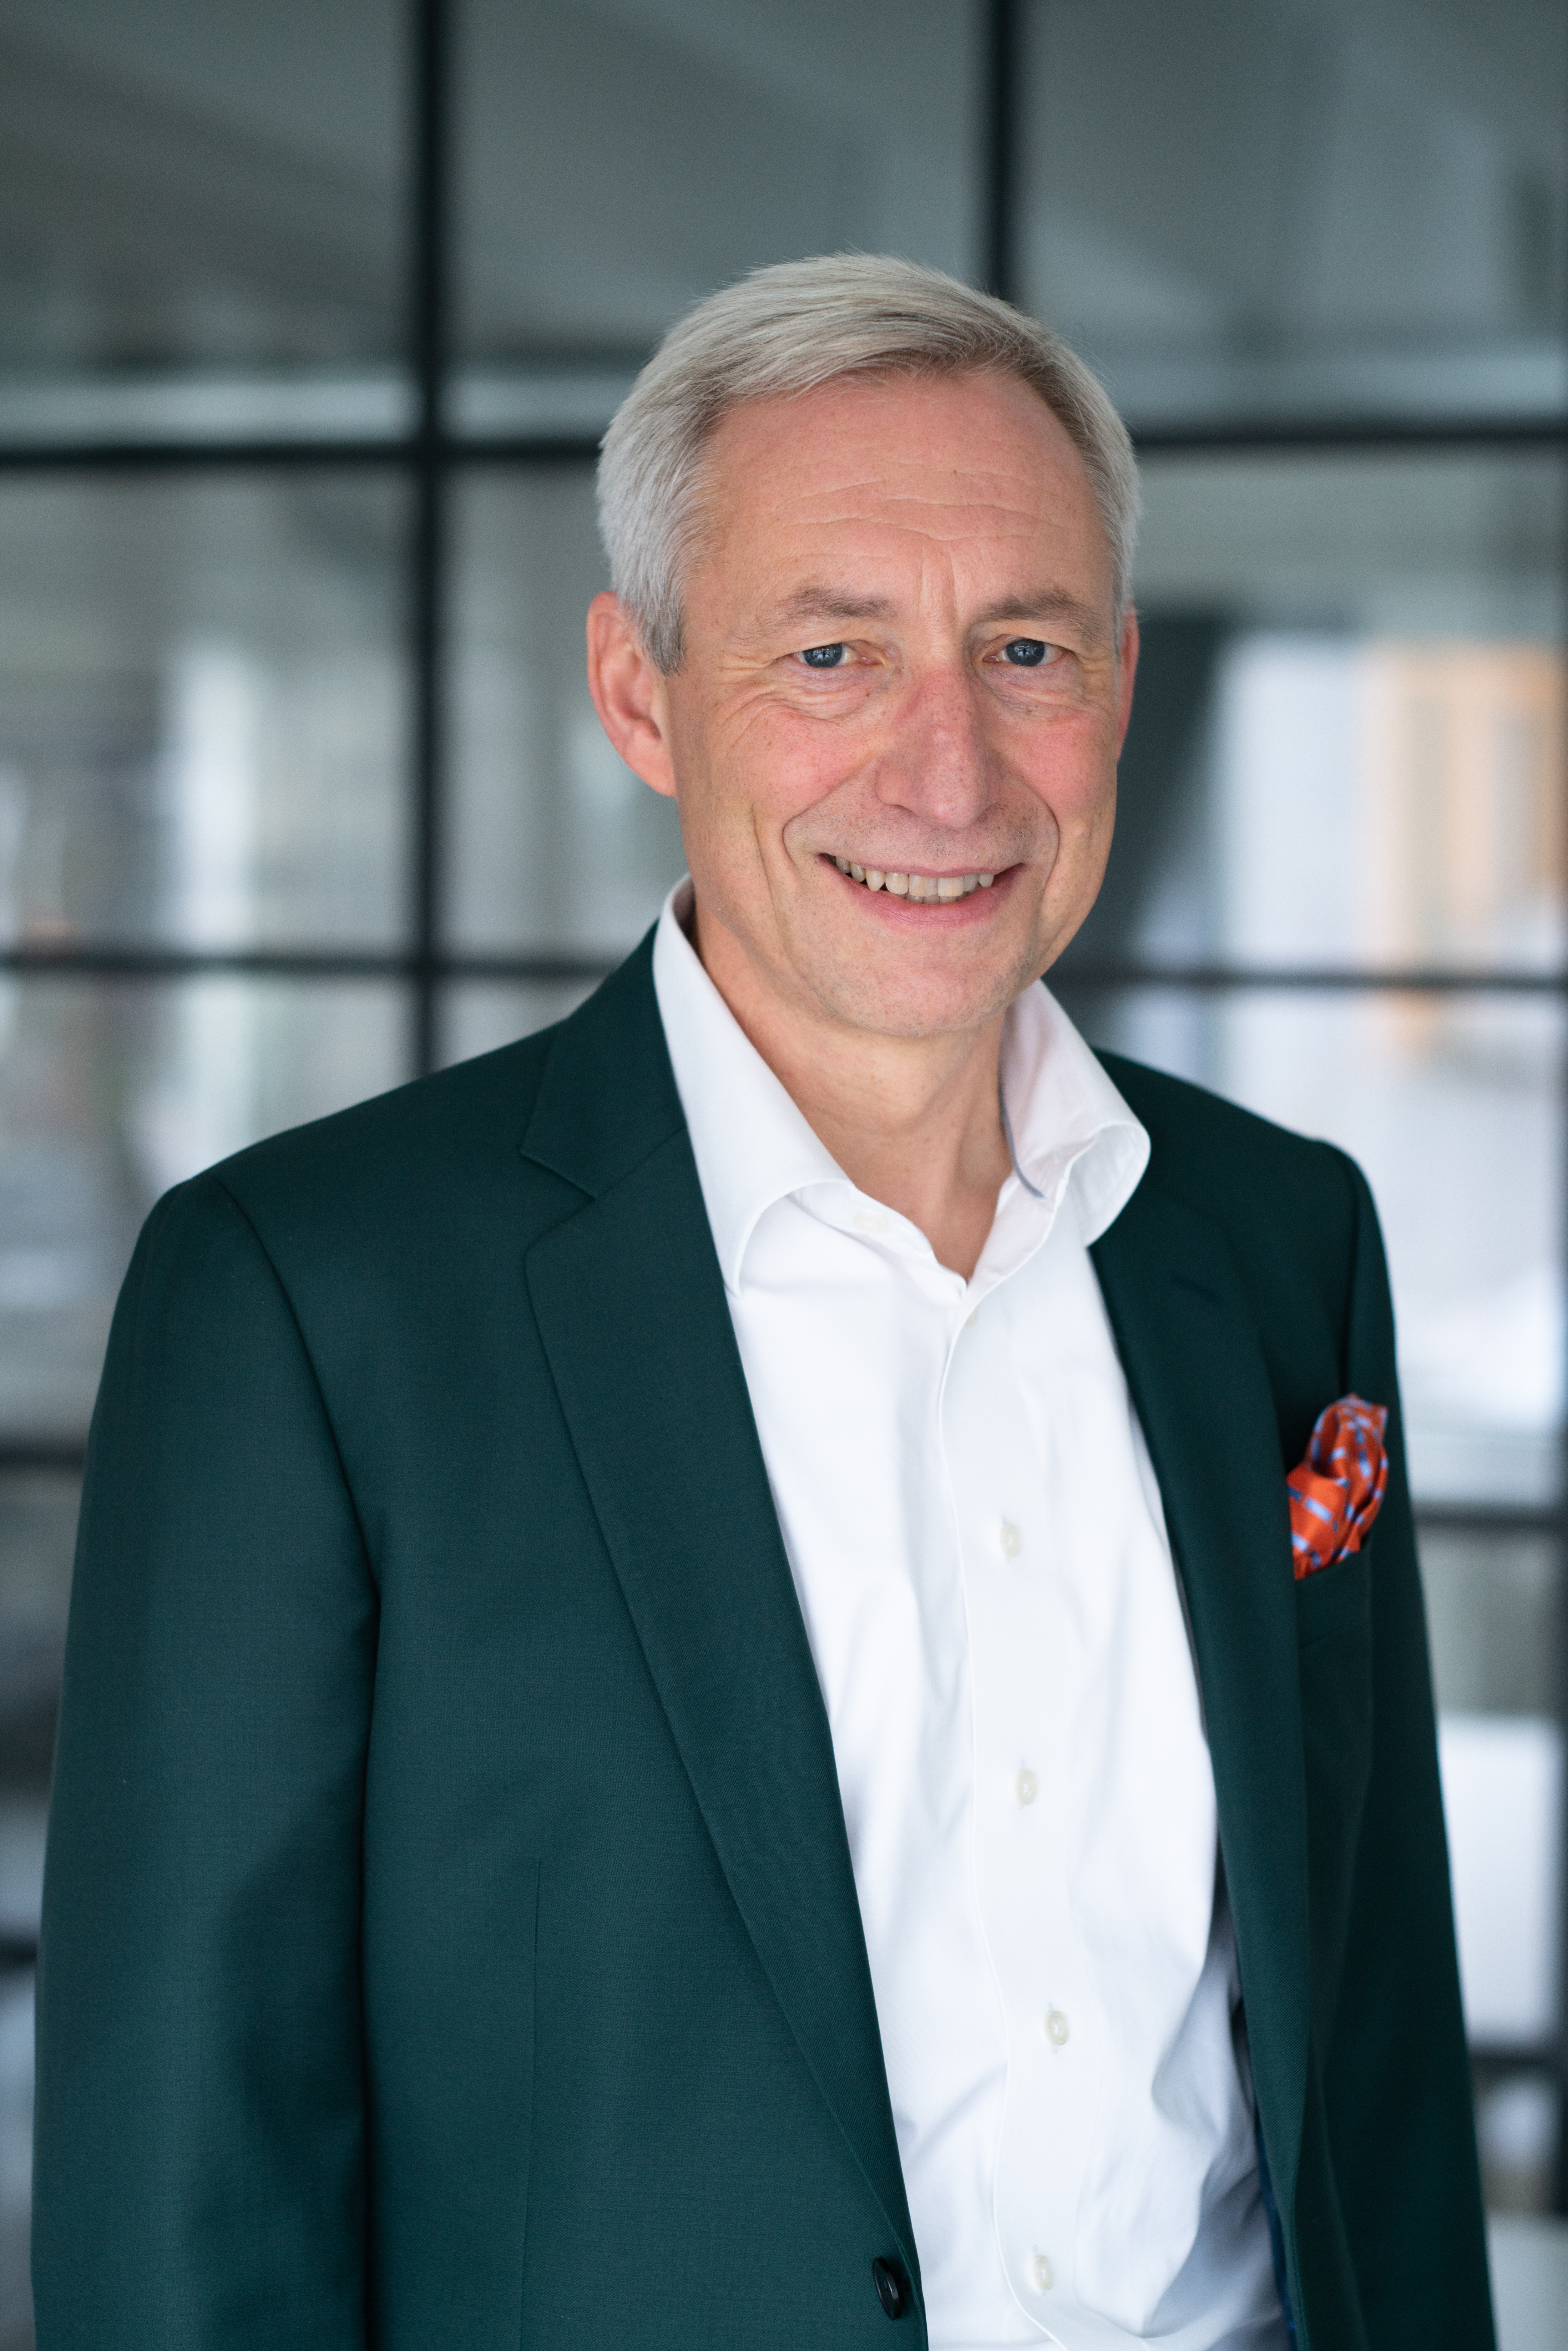 Paul Hansen, Service Delivery Director